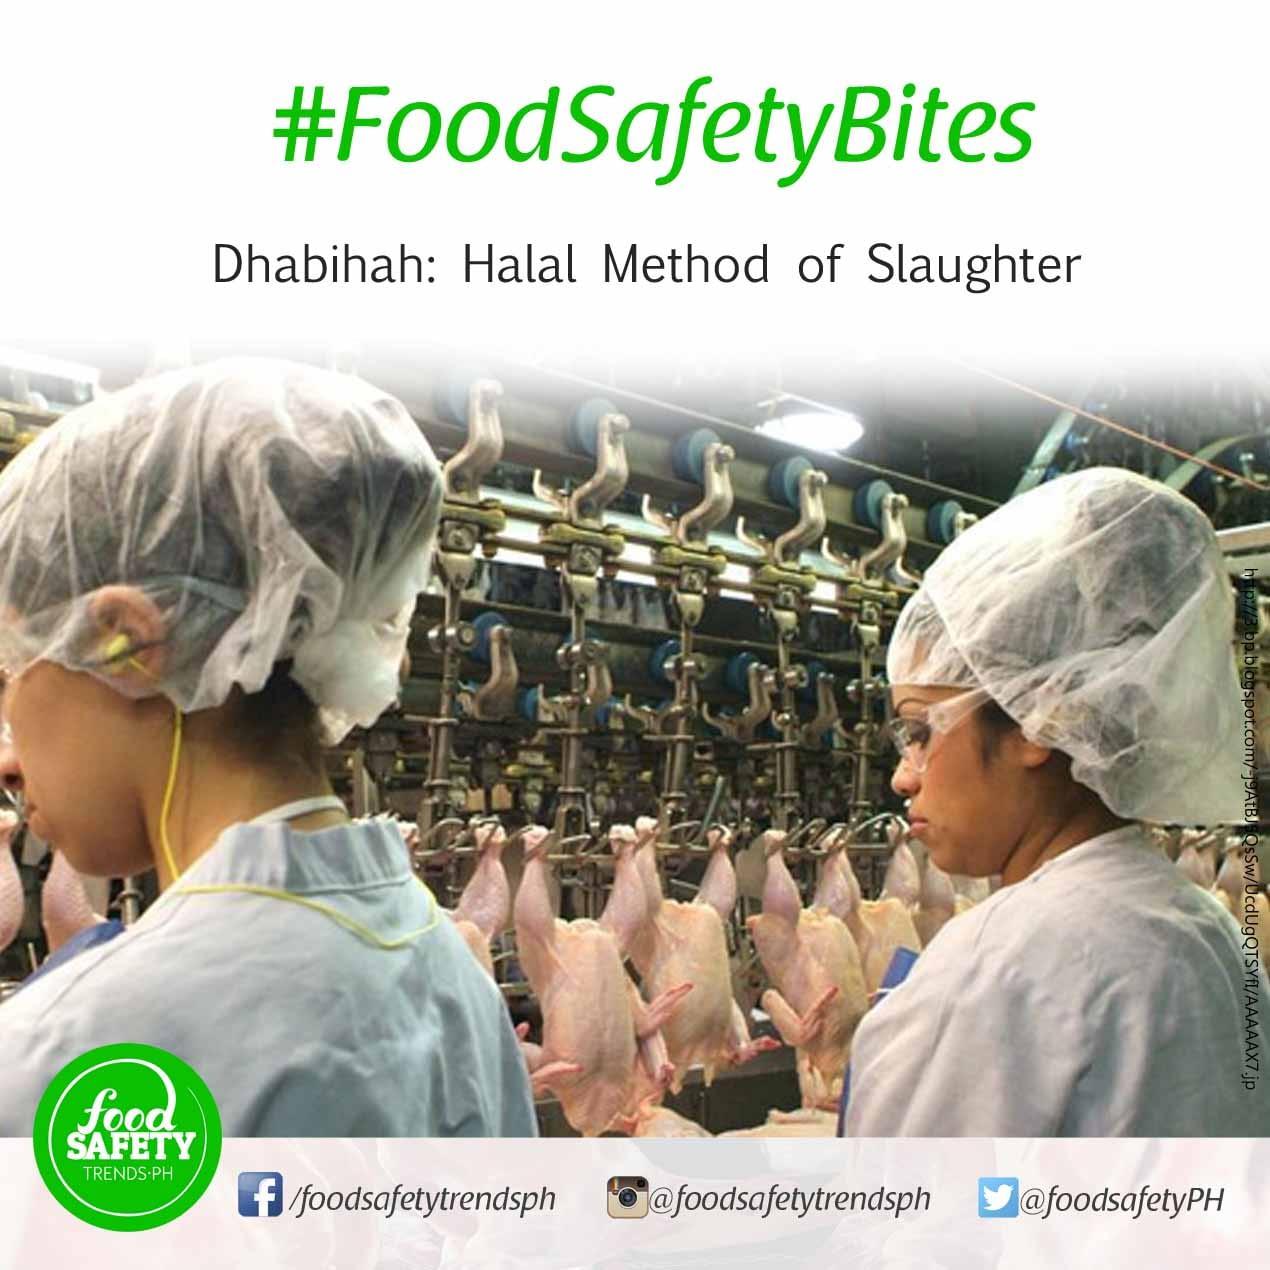 Halal_Food_Safety_HalalFood_HalalCertified_HalalPhilippines_Glenwood_Technologies_Food_Safety_Philippines_Food_Safety_Trends_Magazine_Halal_Slaughter_Food_Safety_Halal_Certification_Dhabihah_